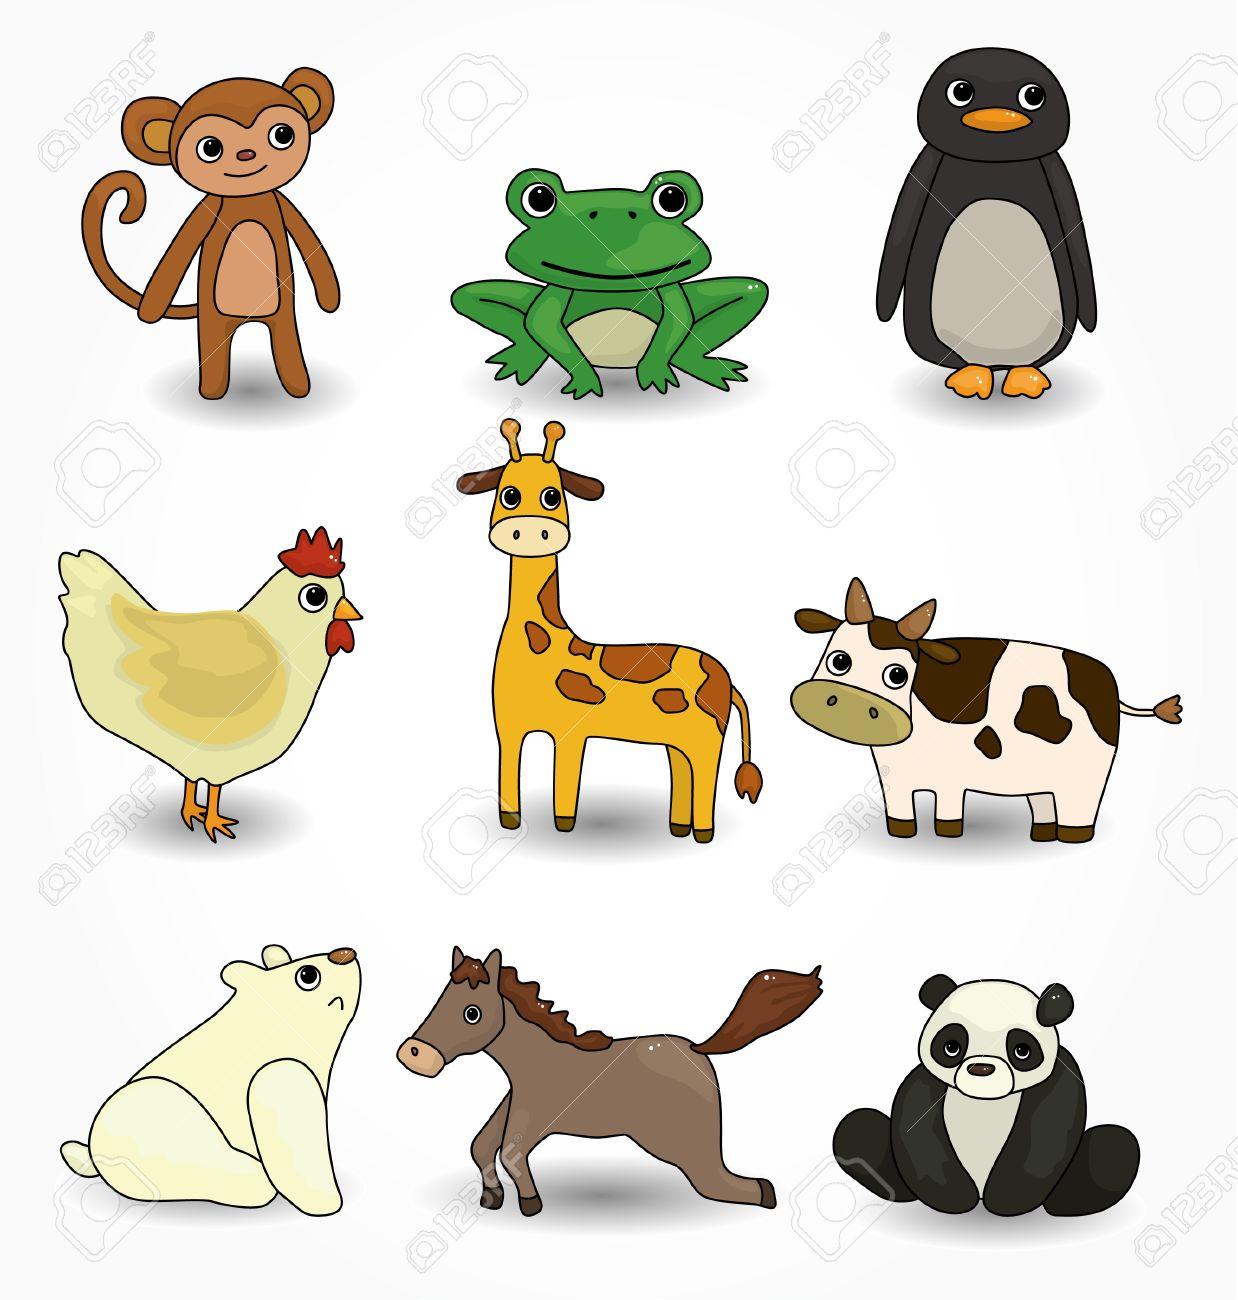 cartoon animal icons set Stock Vector - 9935305